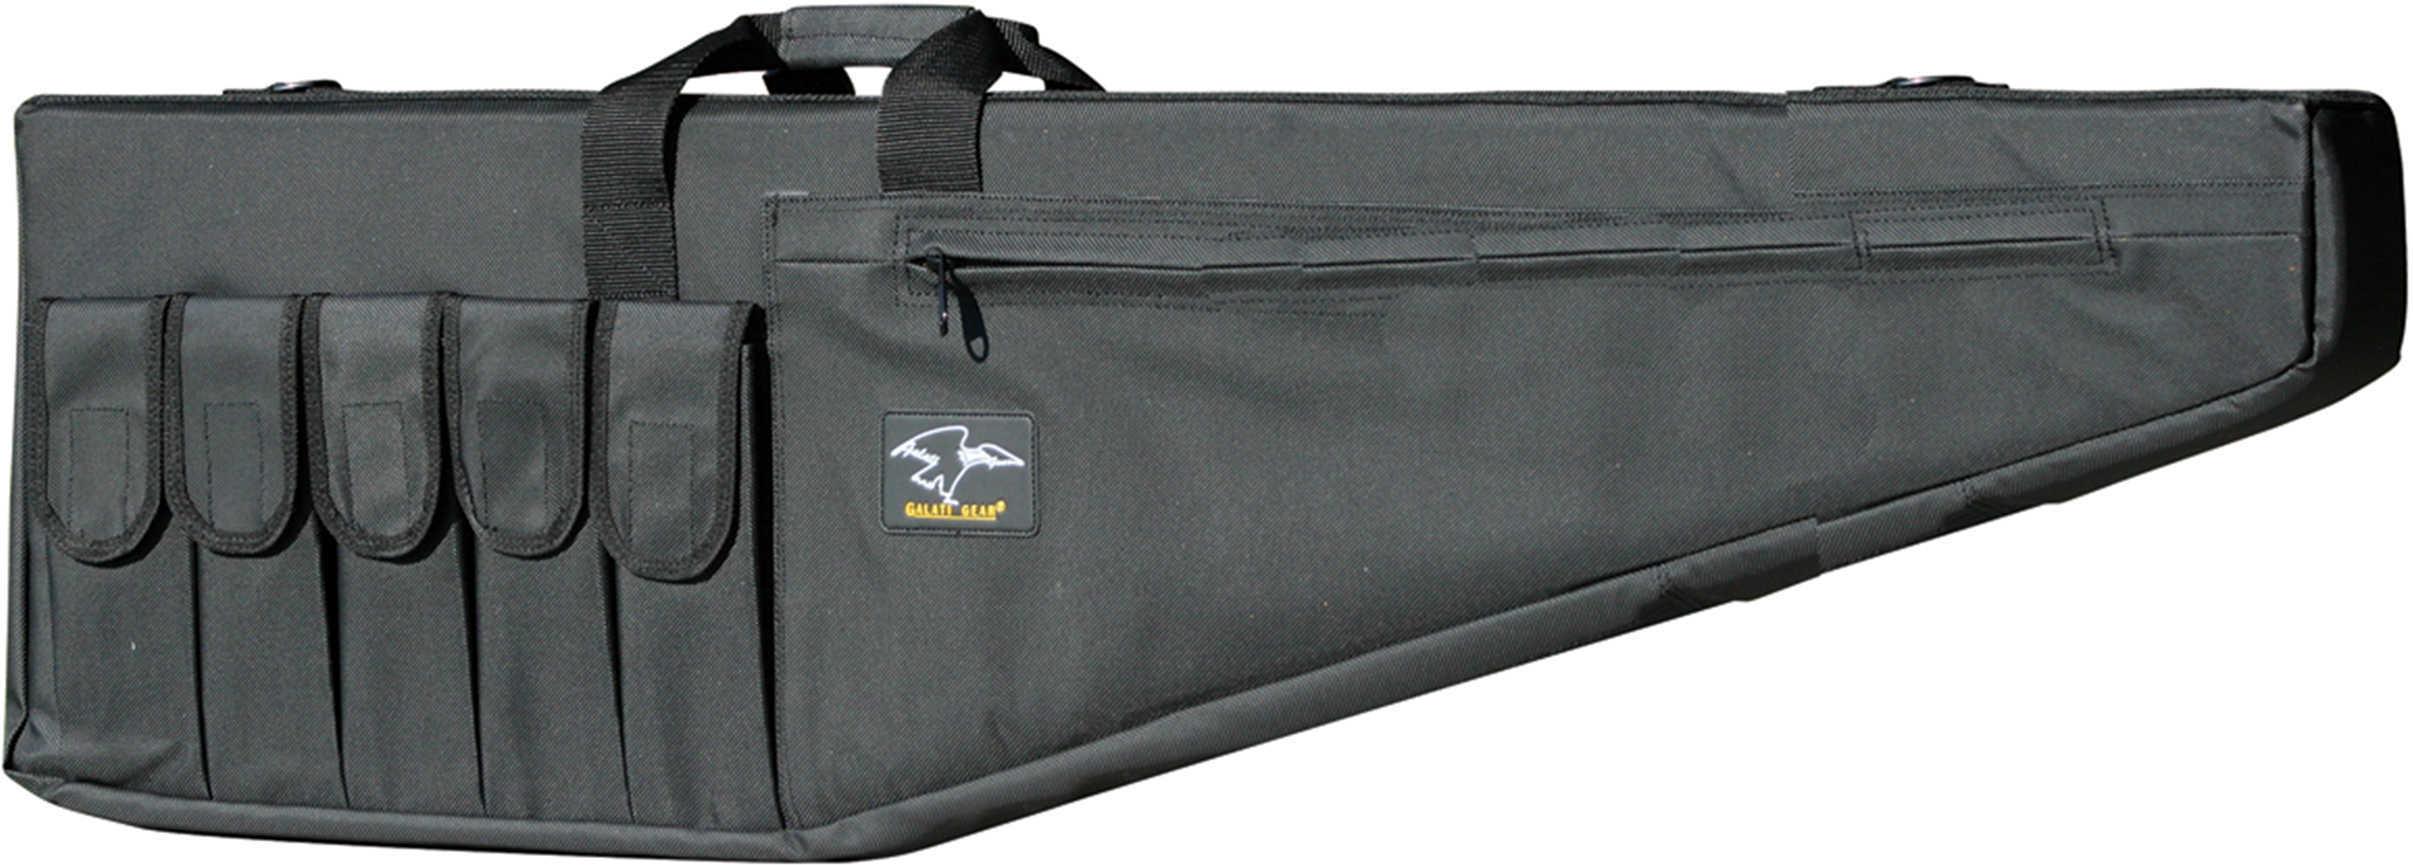 "Galati Gear Rifle Case - 46"", Black Md: 4612XT"